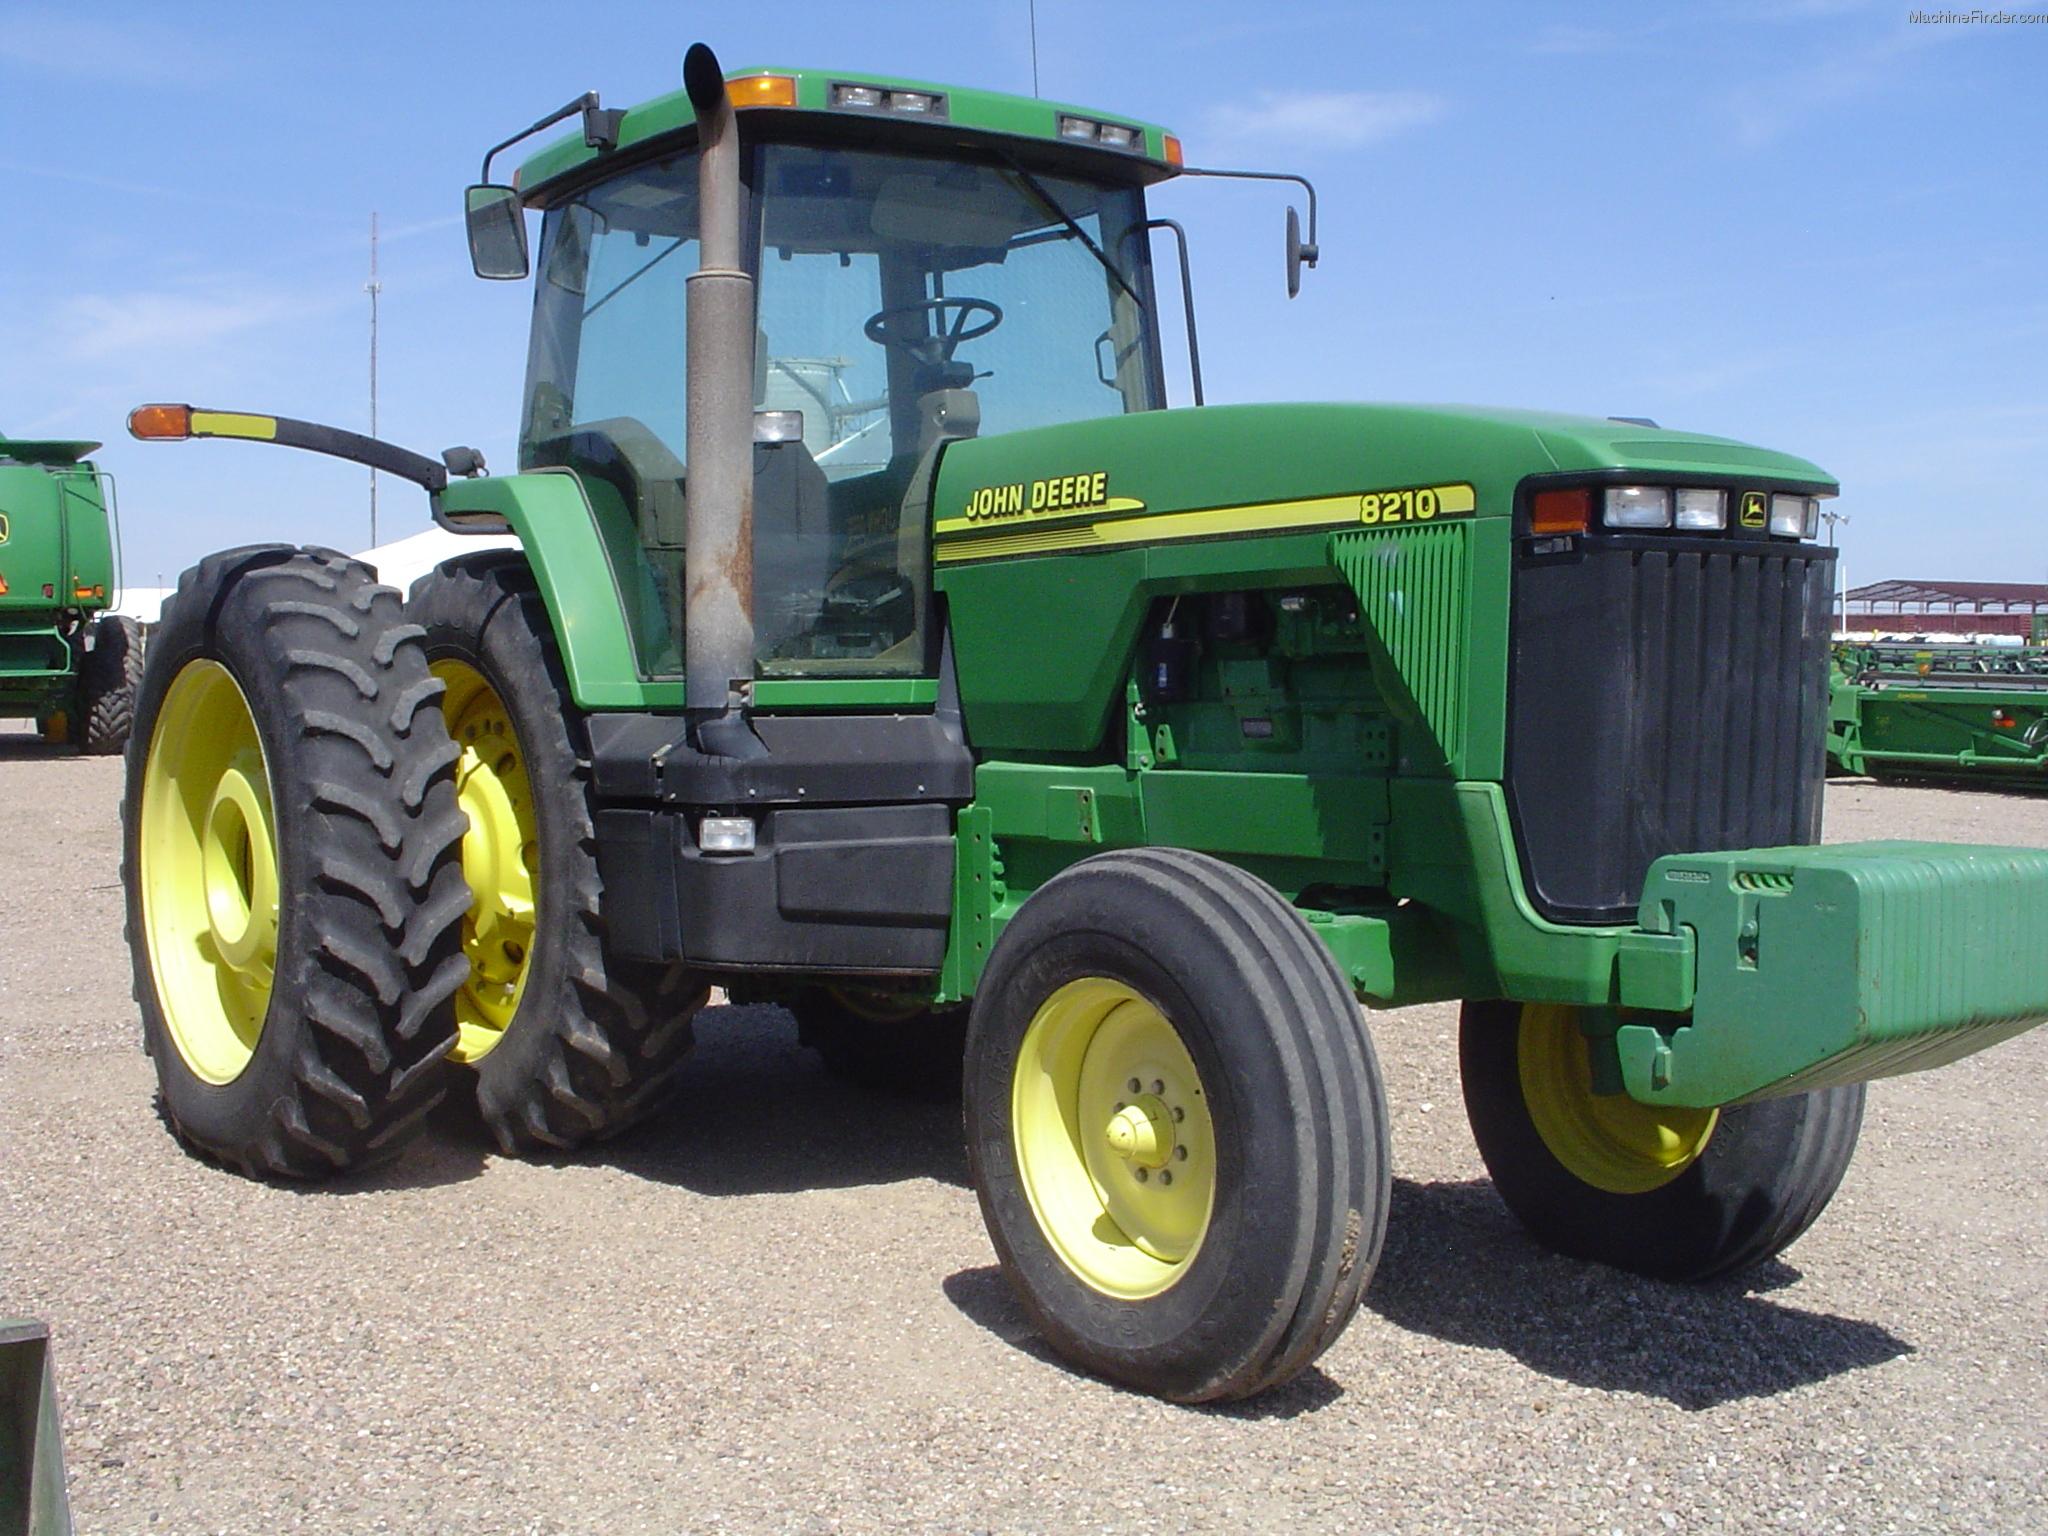 John Deere 820 Farm Tractor Tractors 8410 Wiring Diagram 8210 Machinefinder My News Faq Help Financing Certified